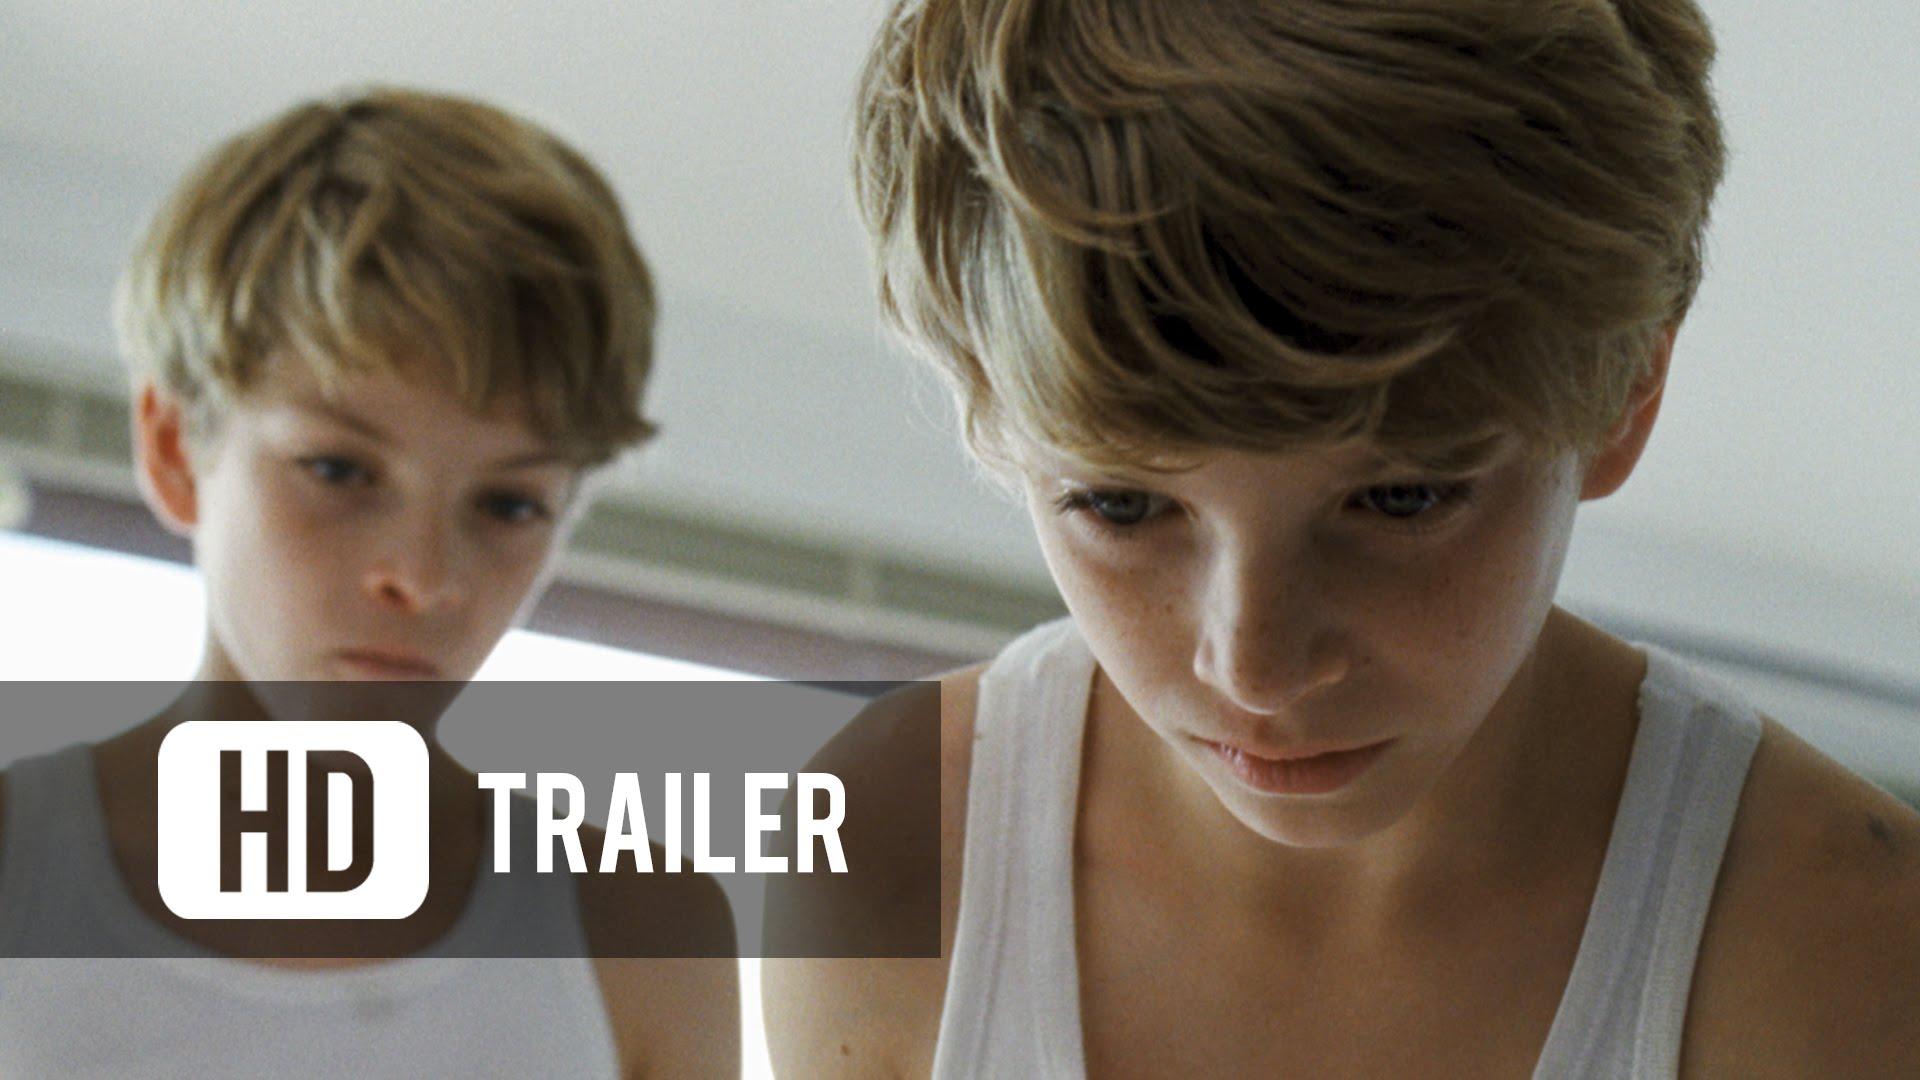 Ich seh ich seh (2014) video/trailer